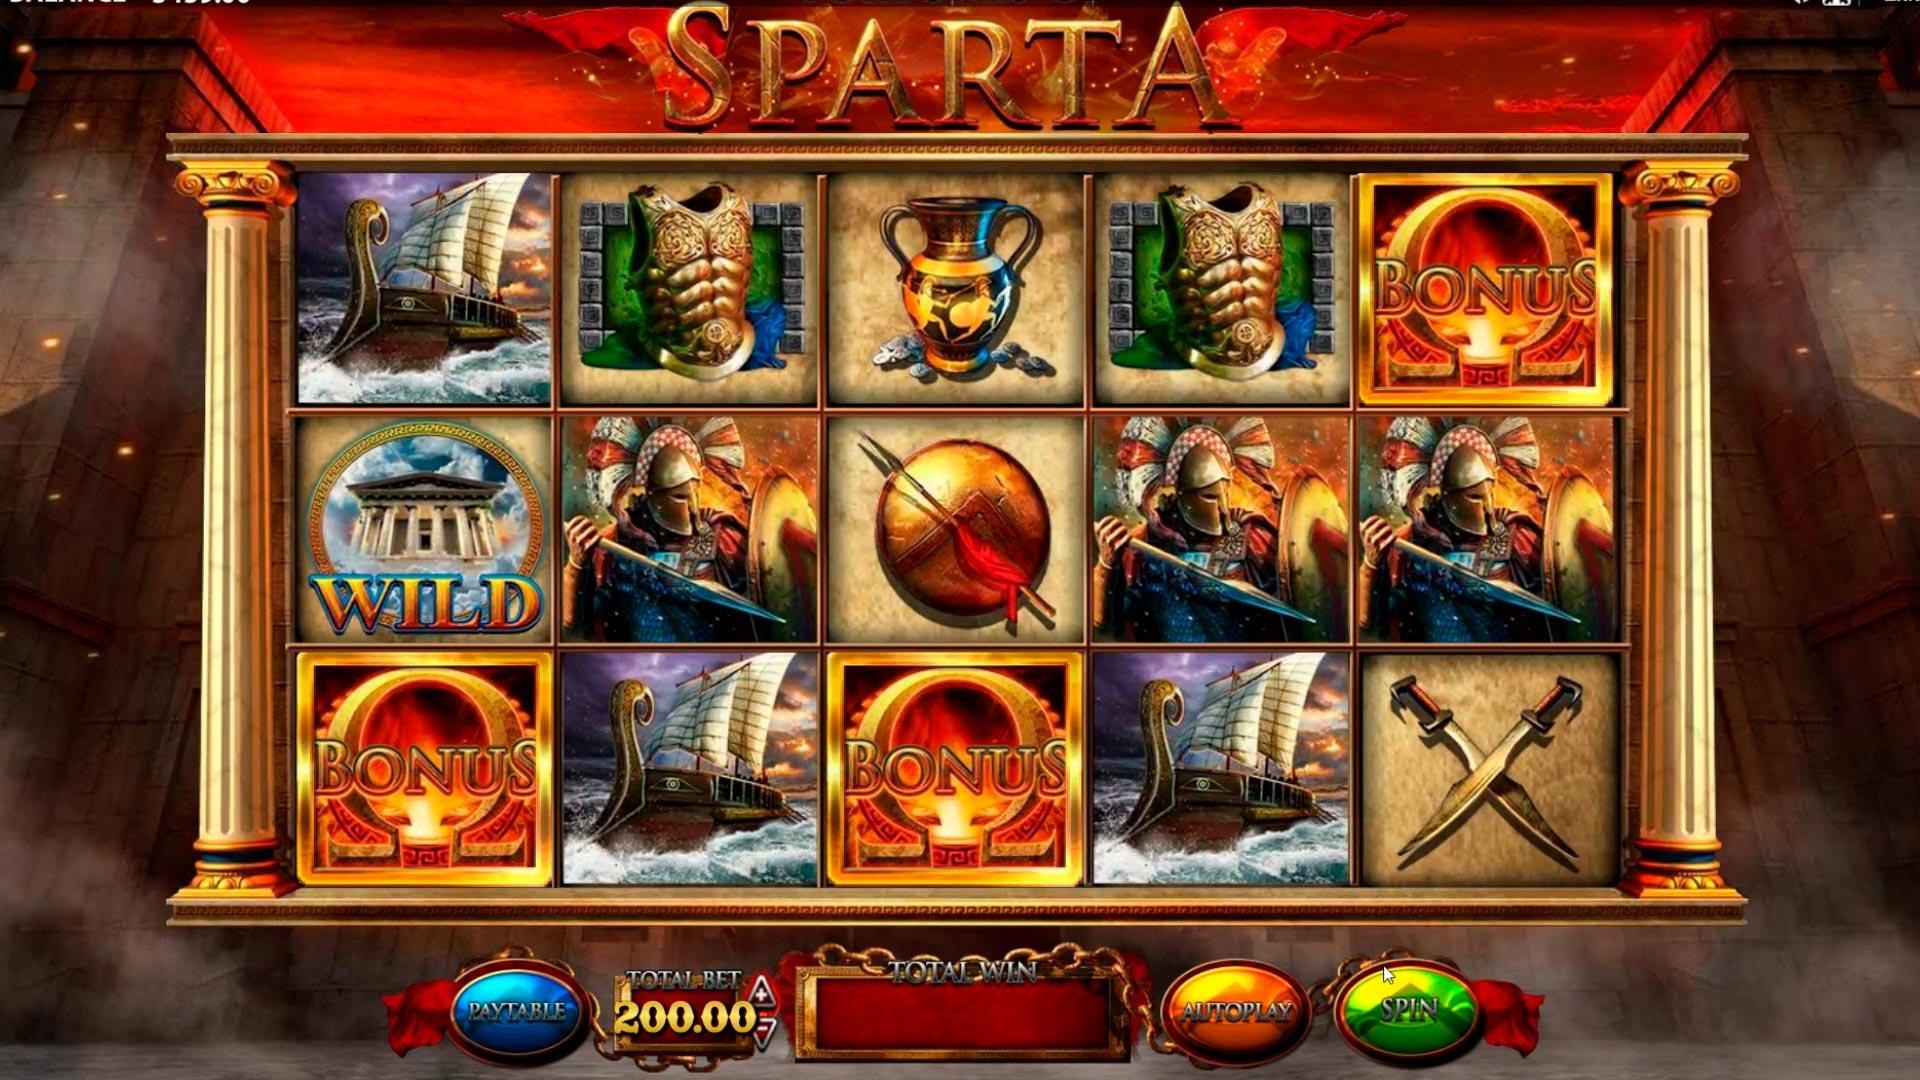 Sparta casino slot büyük kazanmak - € 20.400